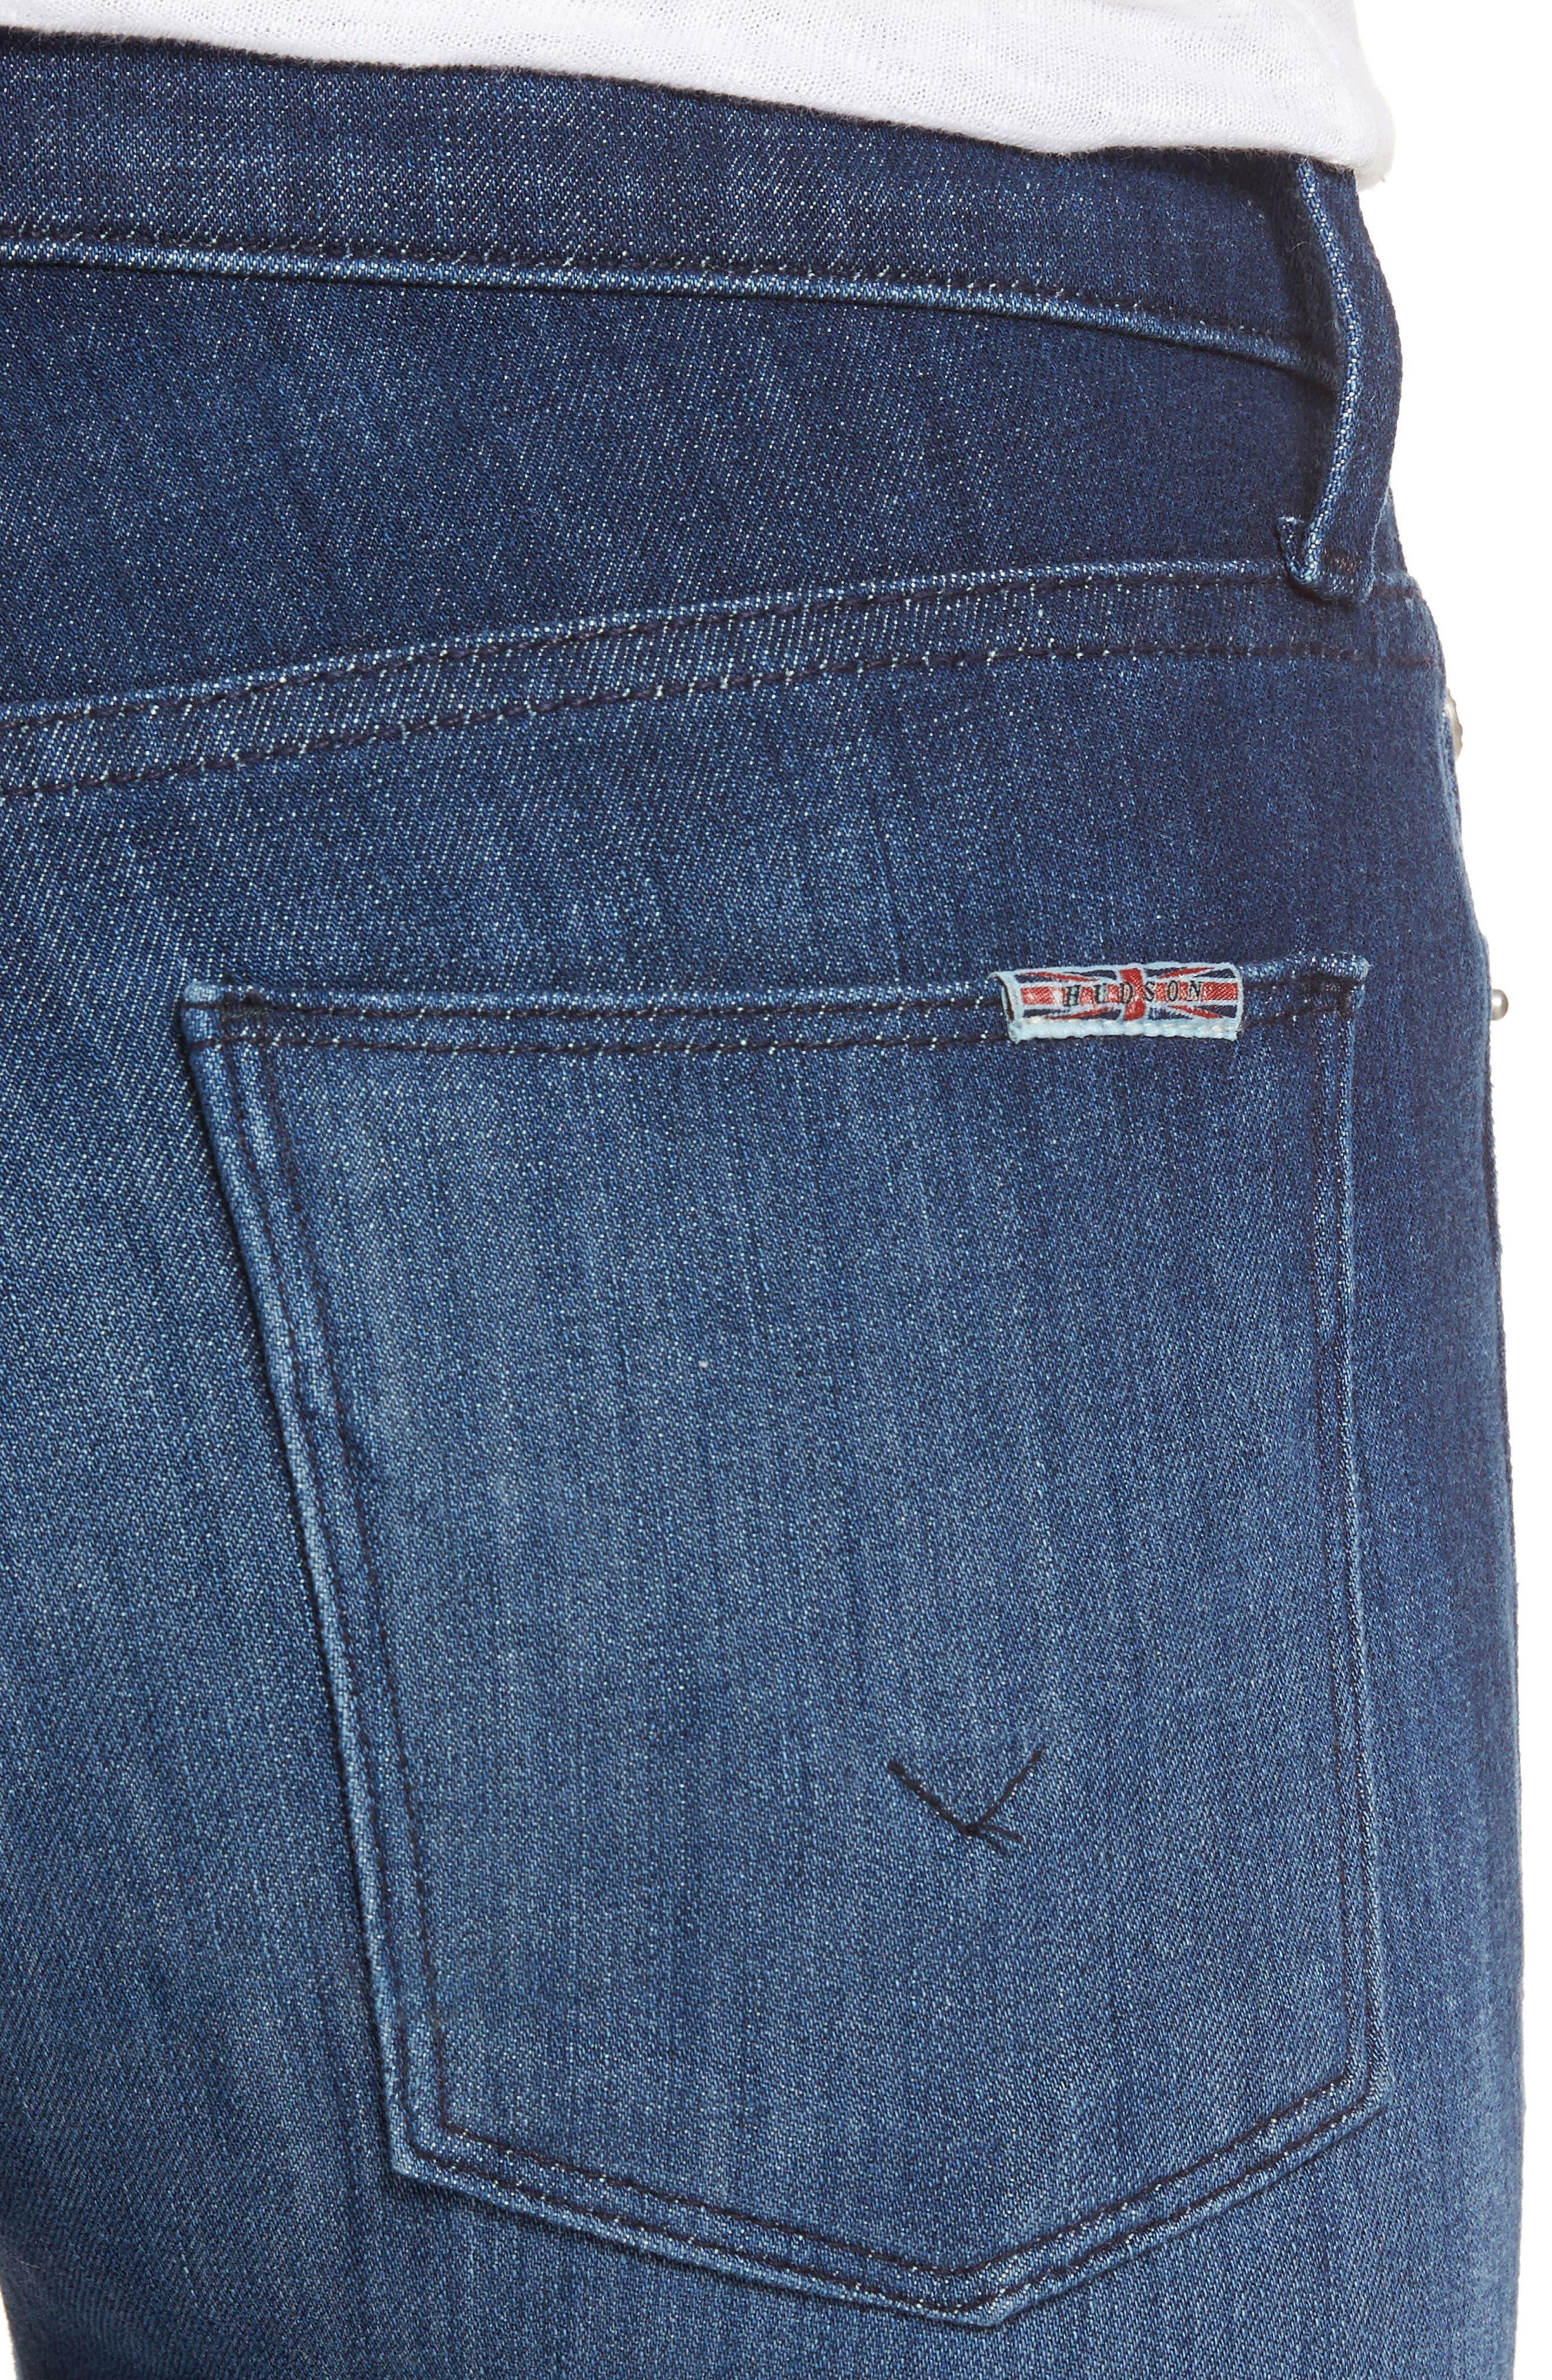 Nico Super Skinny Jeans,                             Alternate thumbnail 10, color,